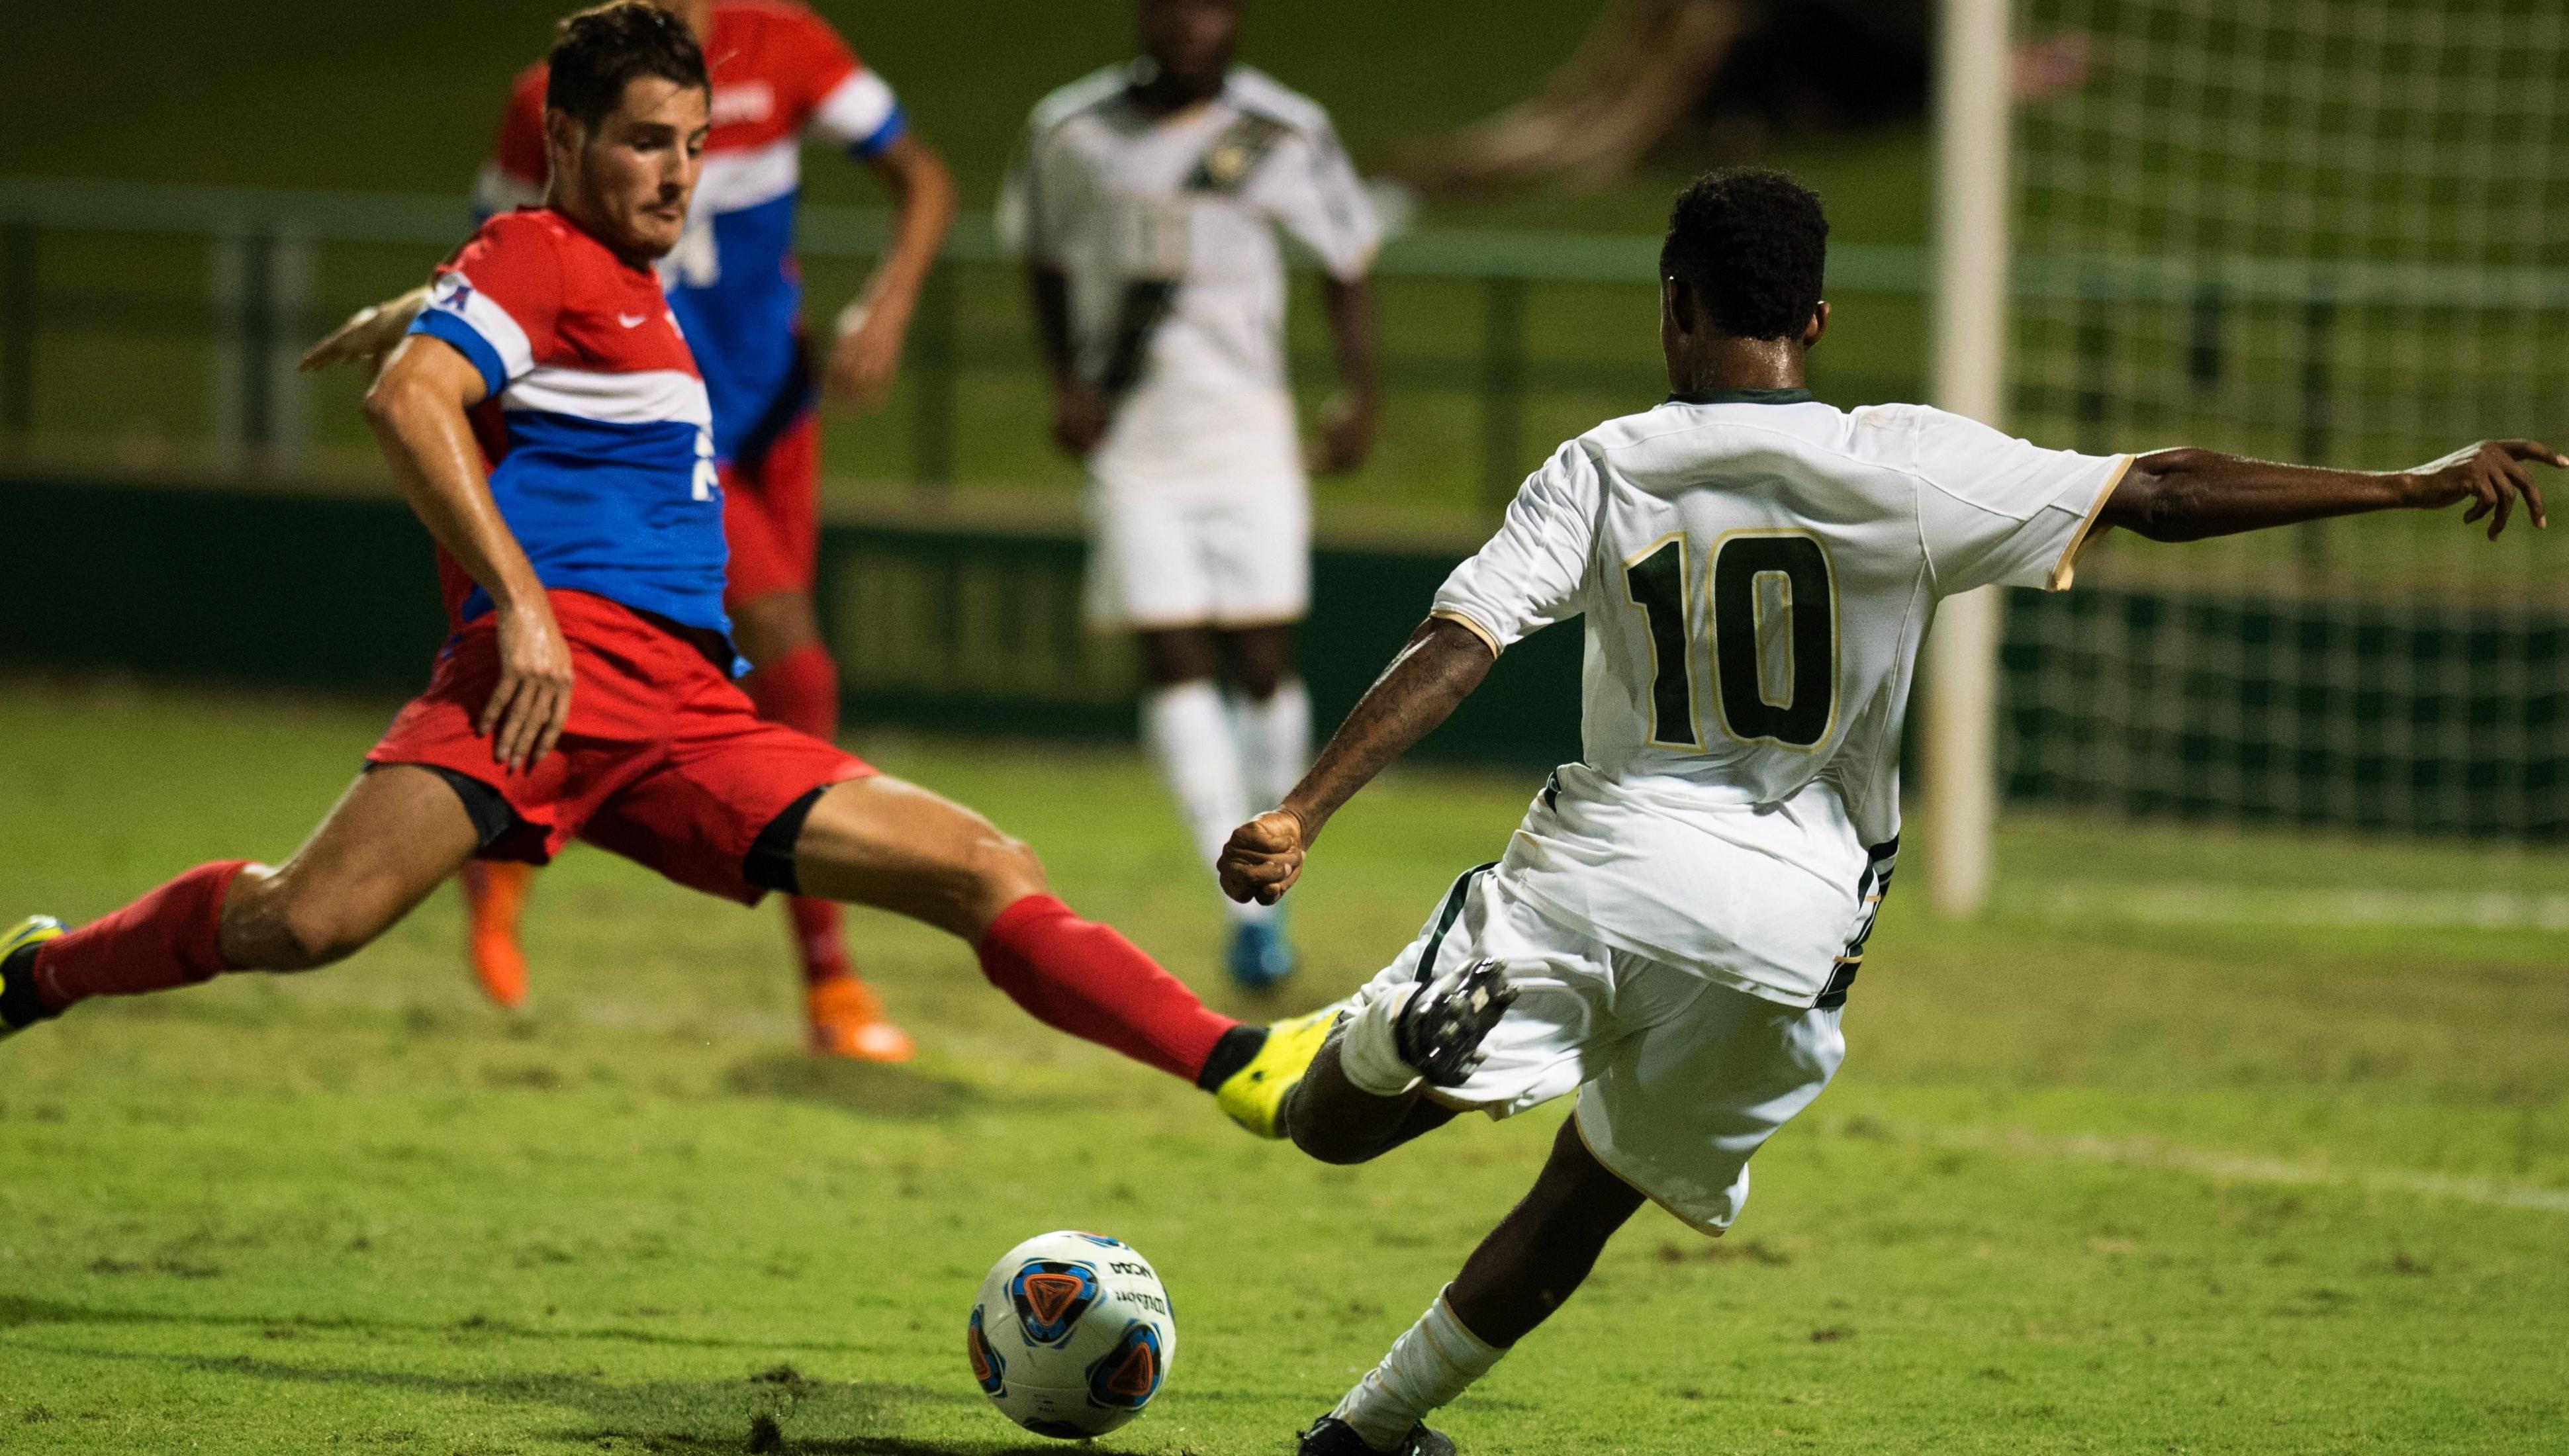 USF Men's Soccer No. 10 Lindo Mfeka (3881x2200)